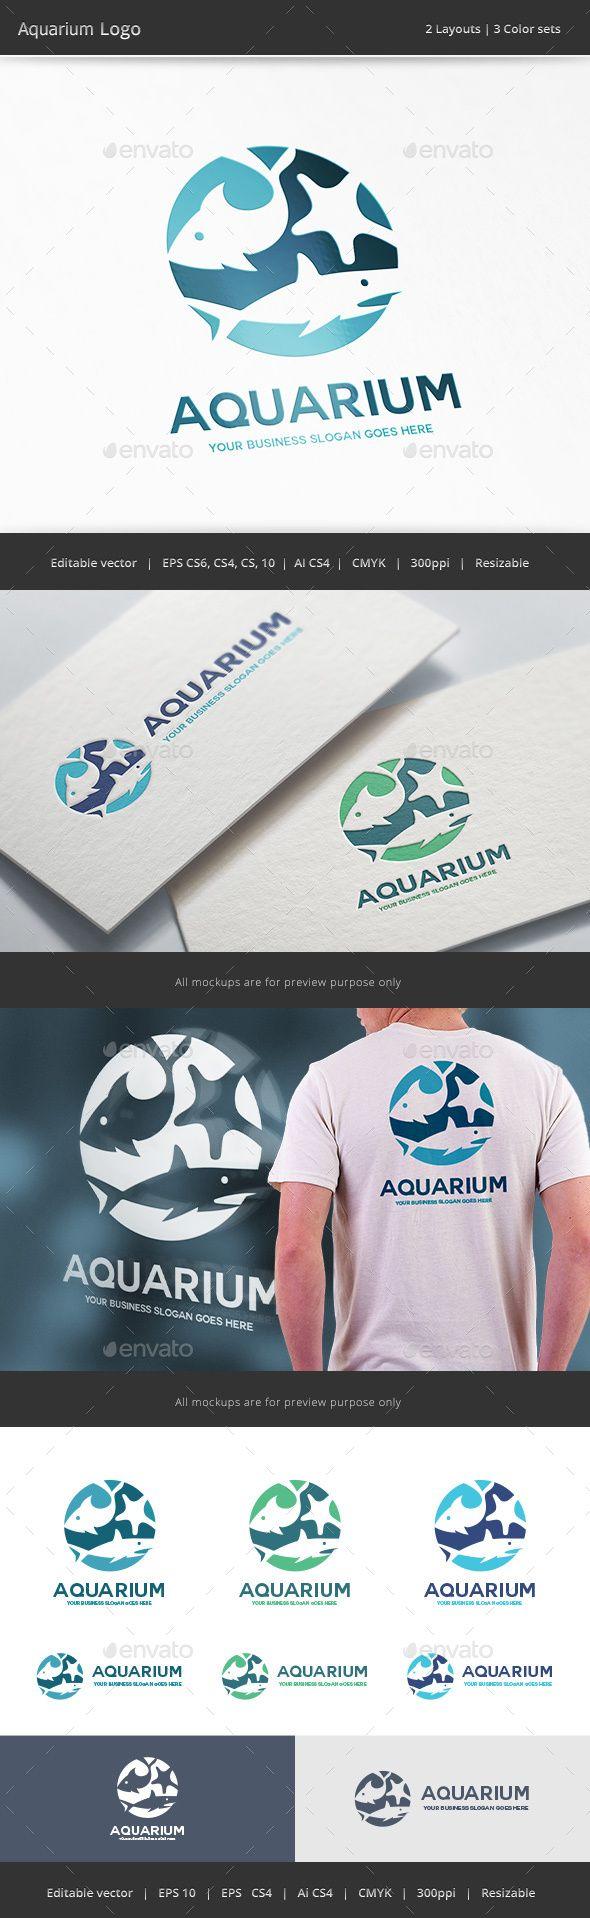 Aquarium Logo — Vector EPS #deep #company • Available here → https://graphicriver.net/item/aquarium-logo/14325890?ref=pxcr